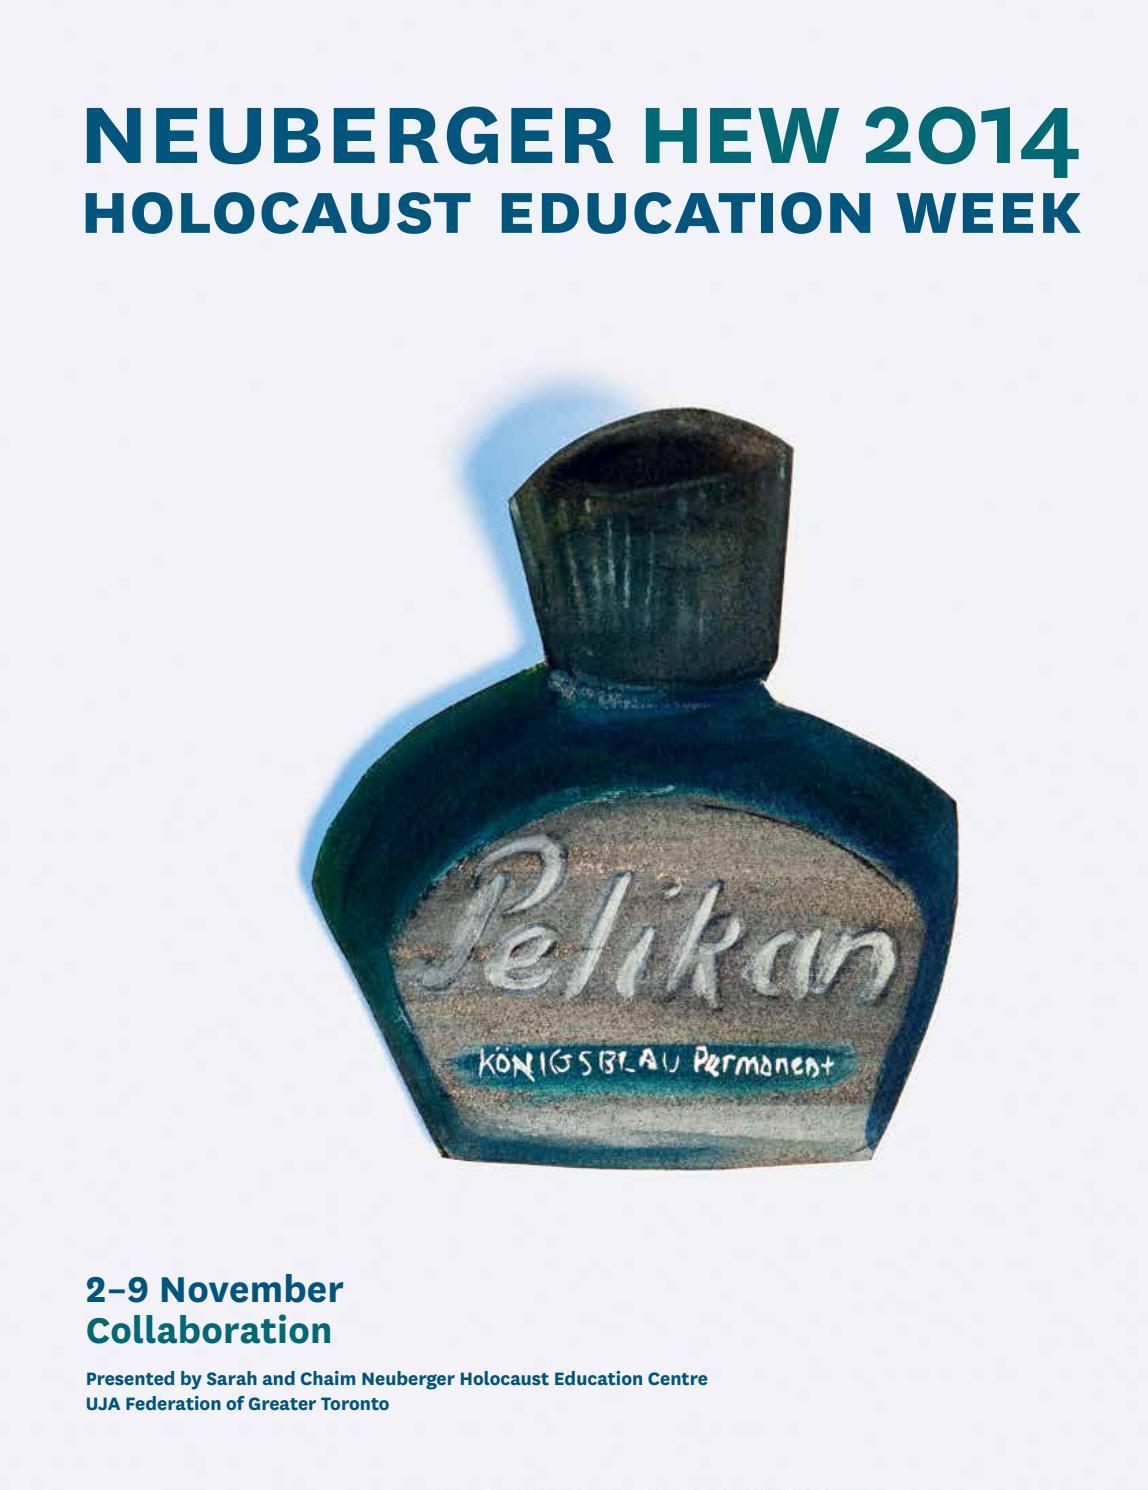 Neuberger HEW 2014 Program Guide By Holocaust Education Week